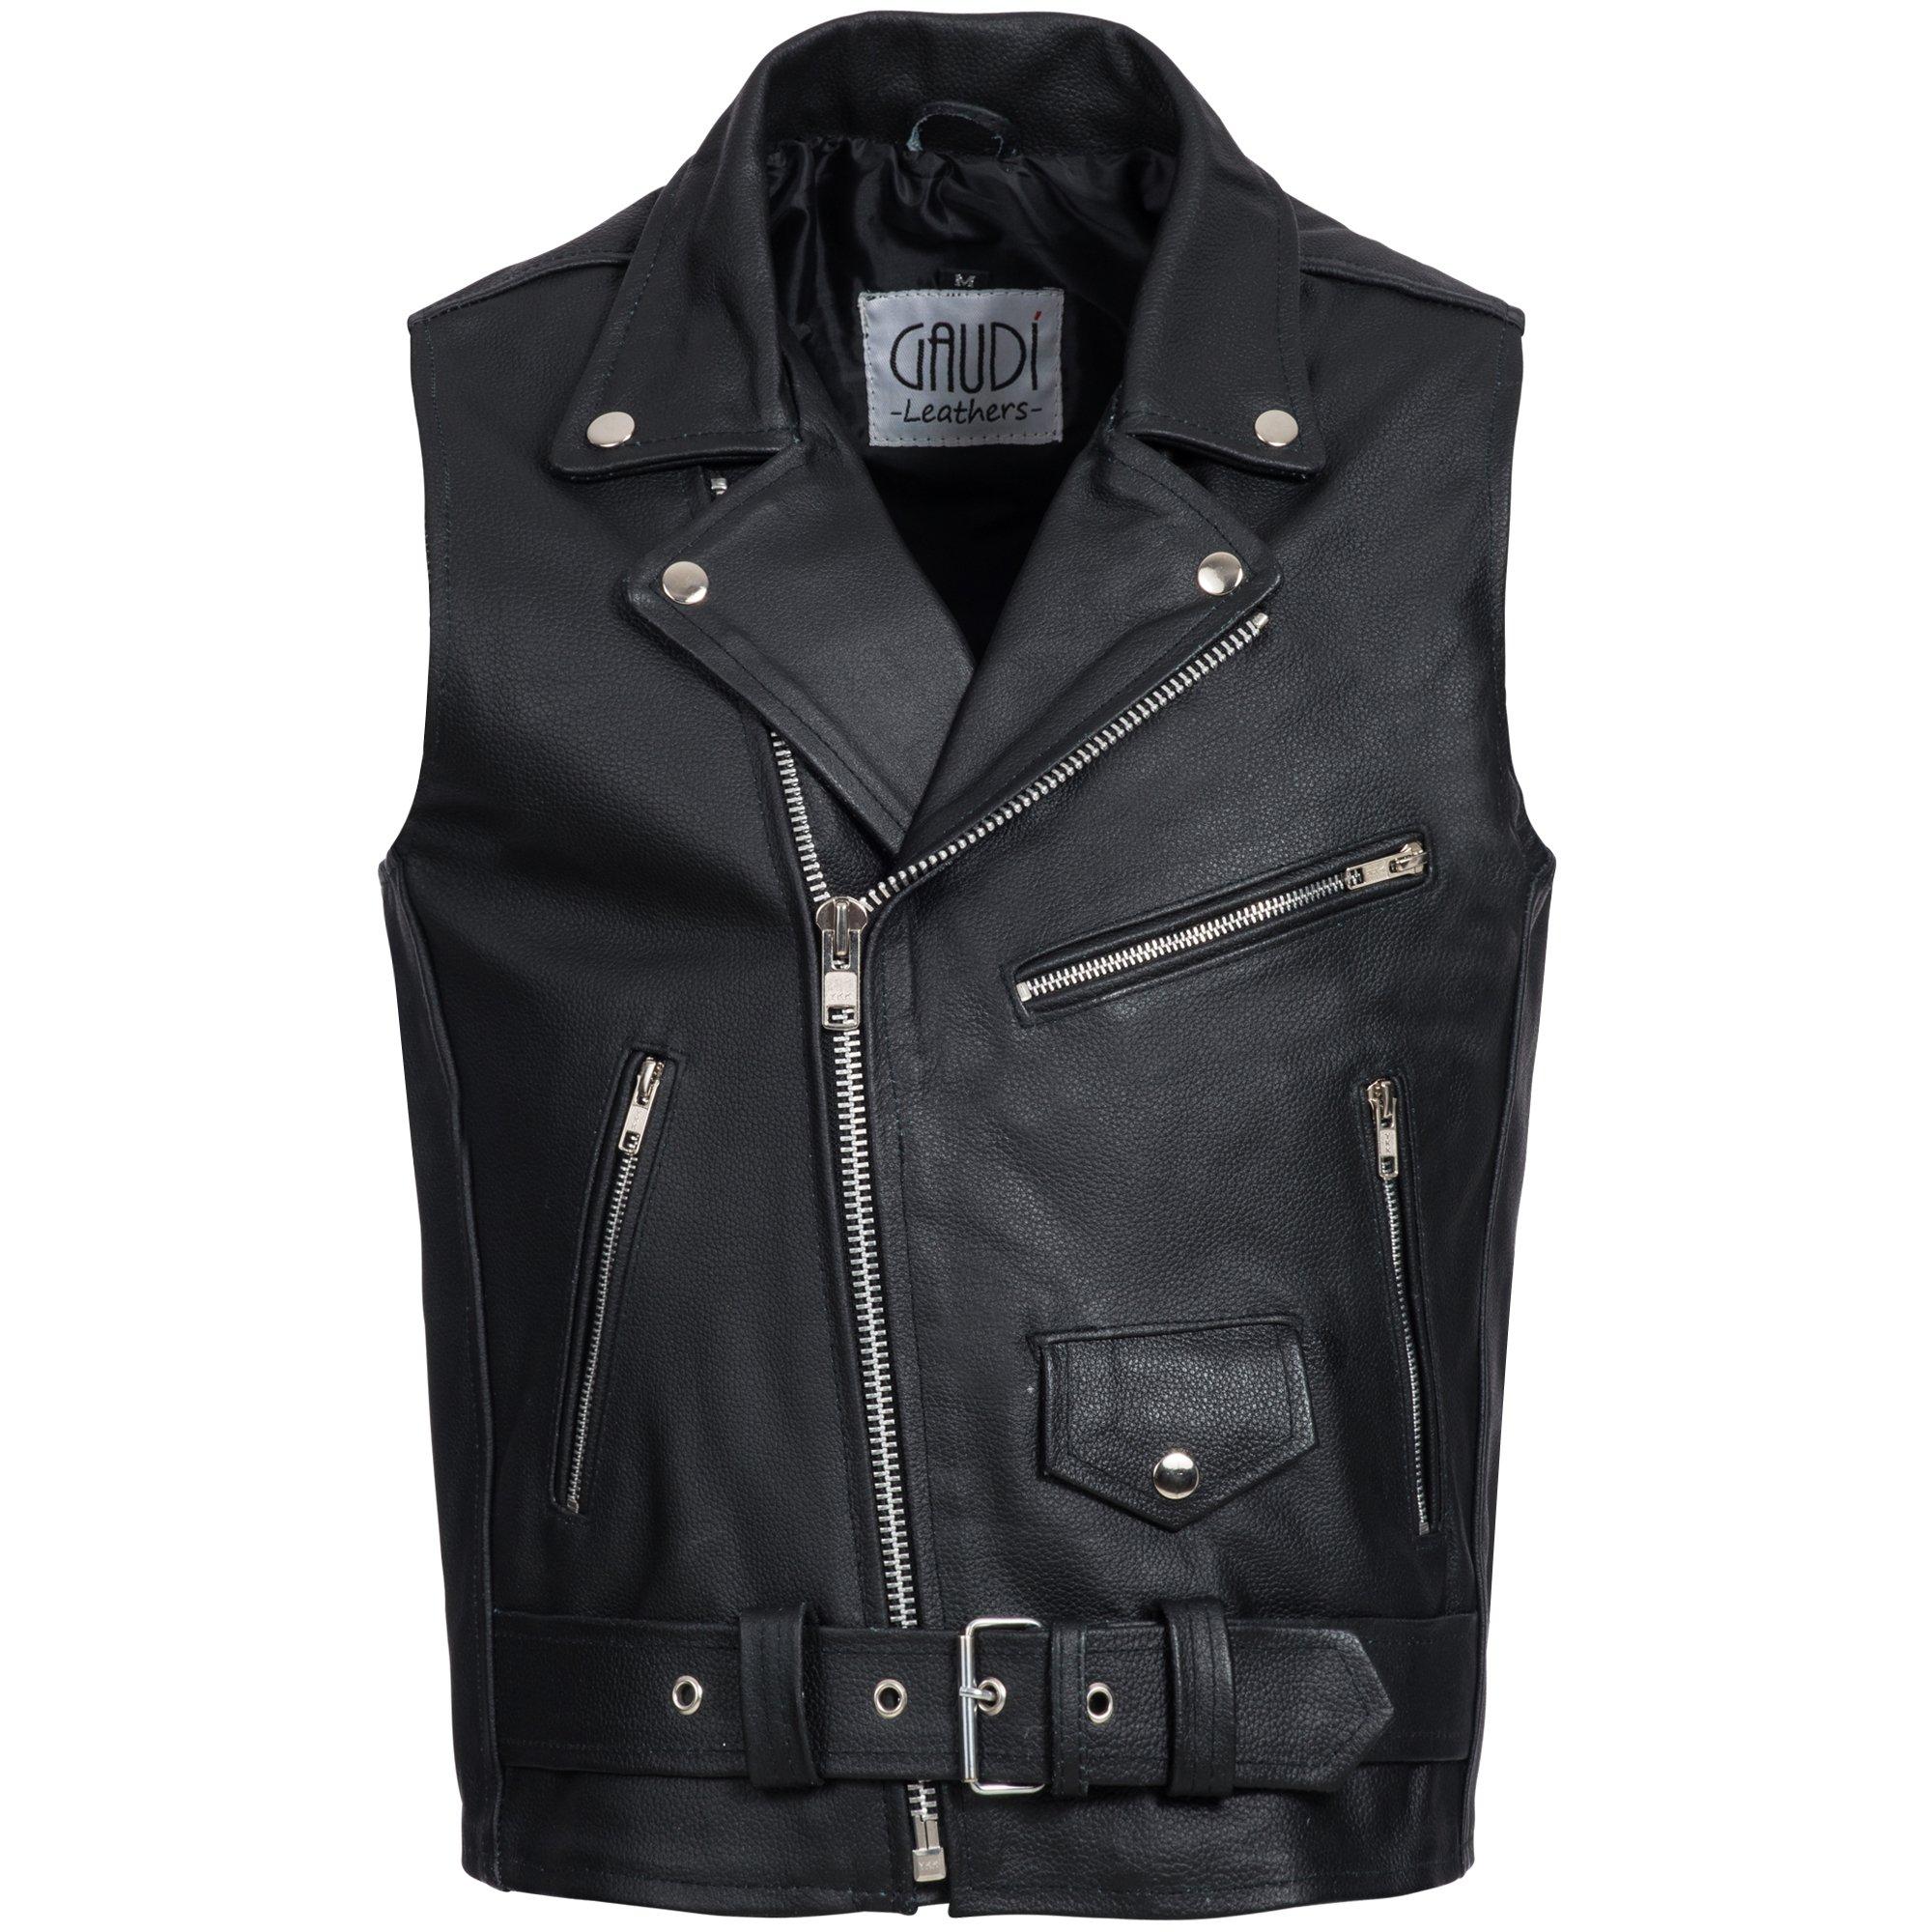 Gaudi-leathers Mens Leather Waistcoat Motorcycle Motorbike Chopper Biker Vest Brando Style in Black S by Gaudi-leathers